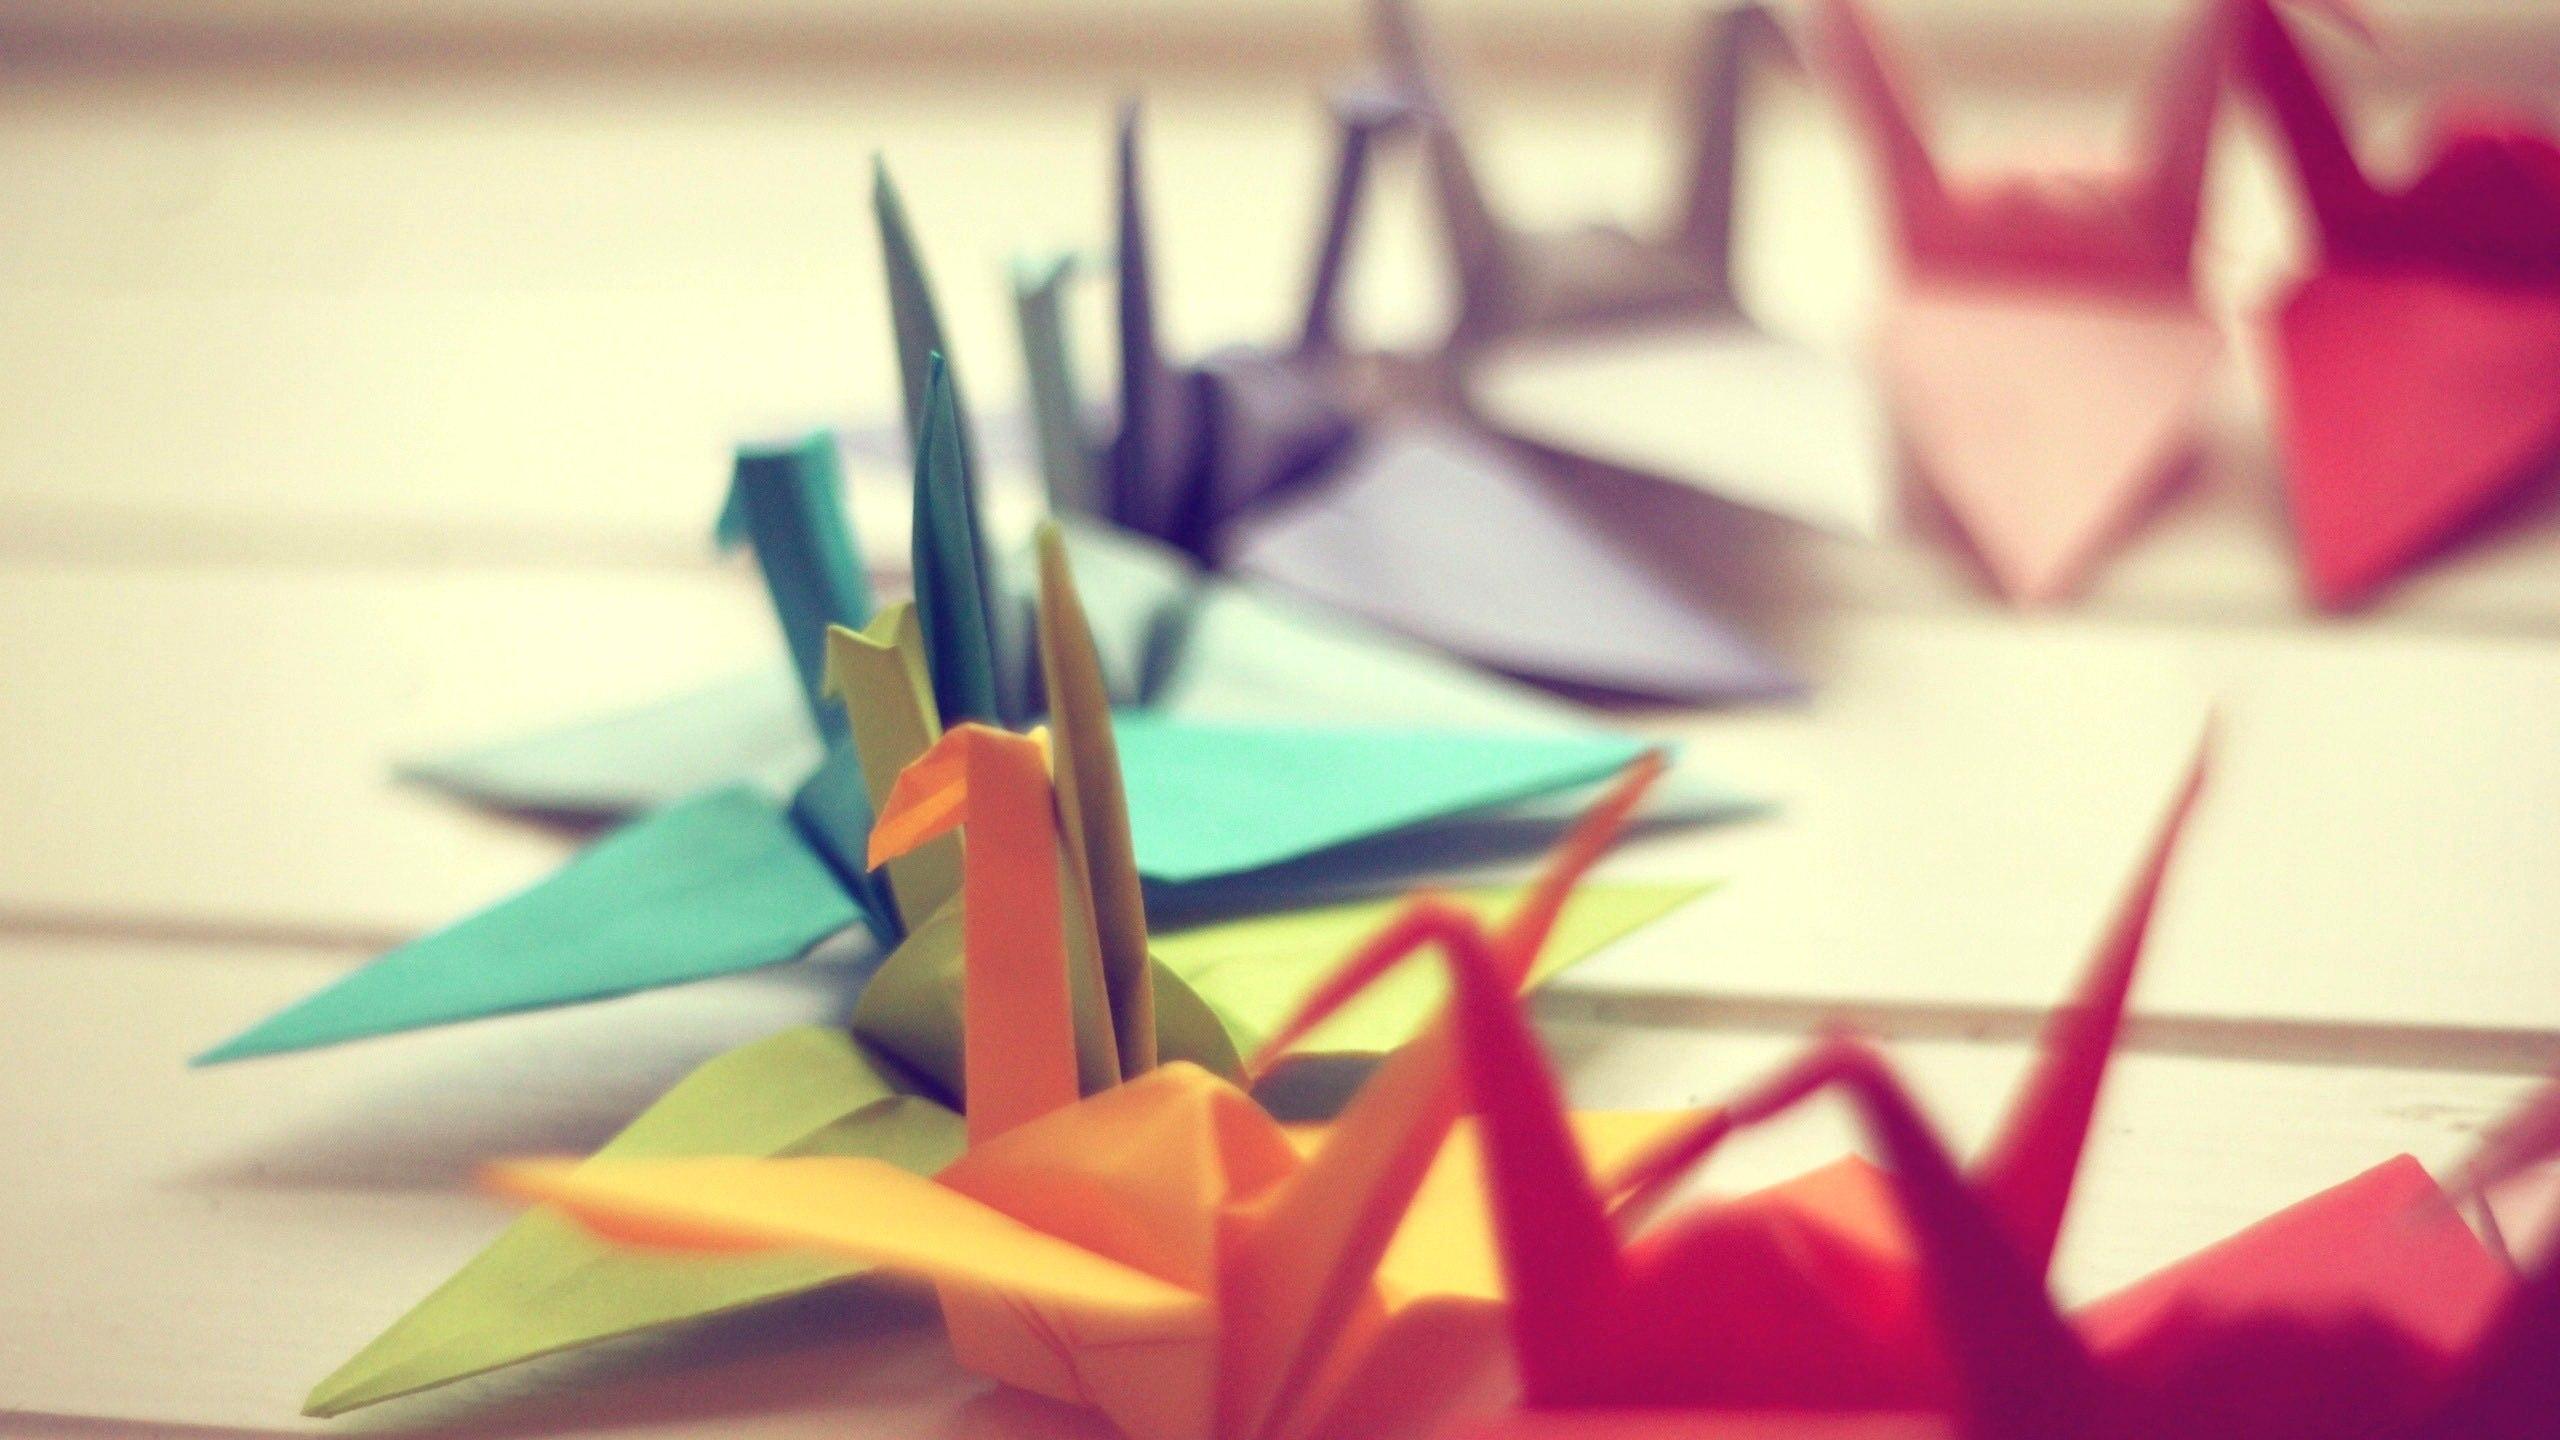 821aa6de4f2b98e1a453e896d11b--dizajn-reklama-origami-zhuravliki.jpg